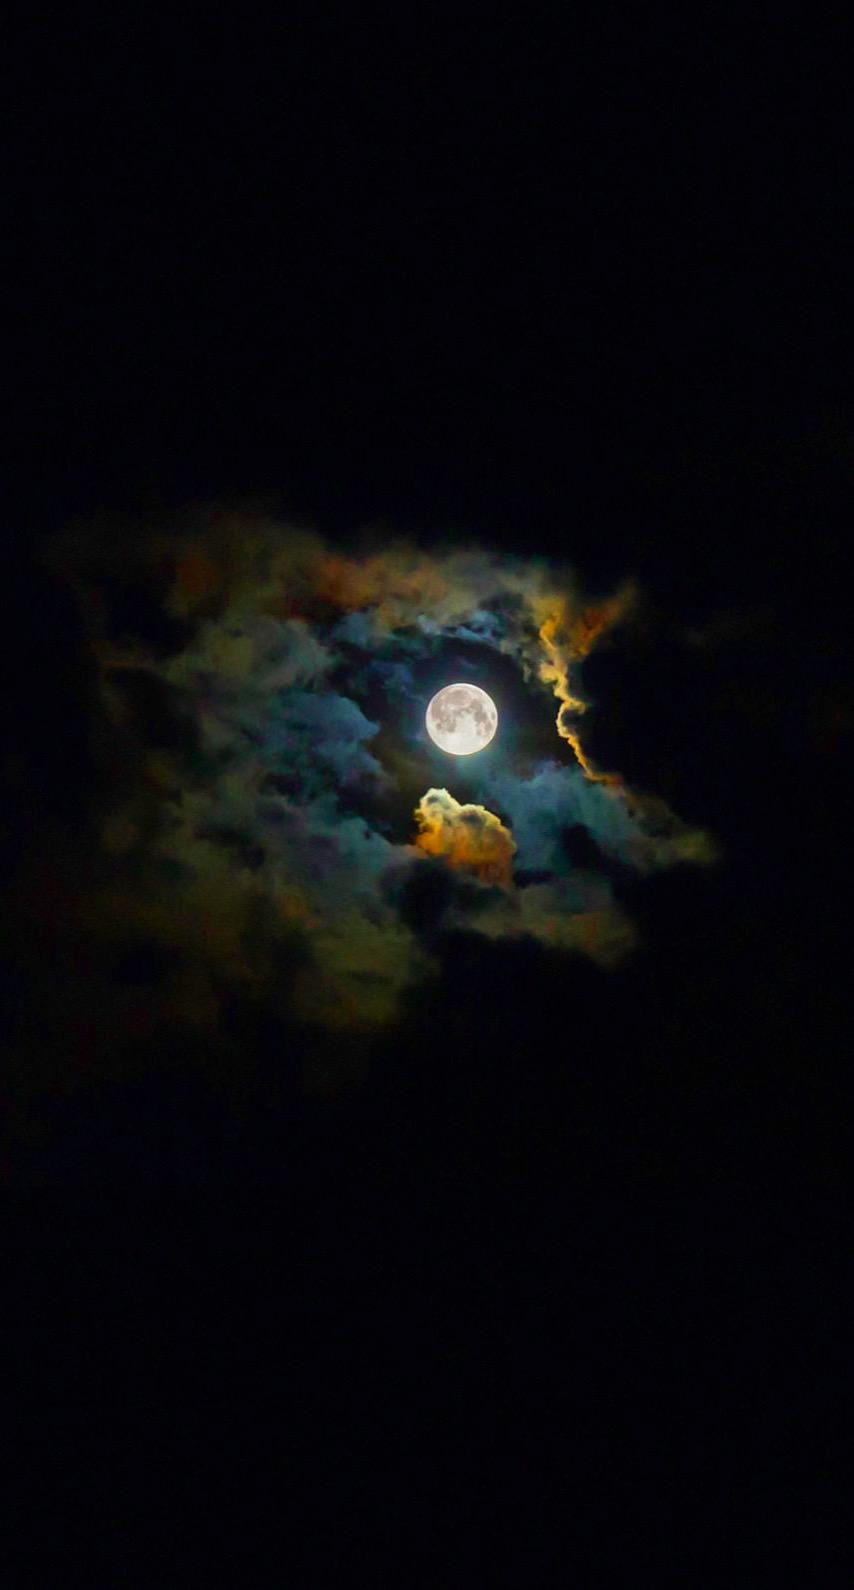 Landscape Moon Shiny Black Wallpaper Sc Iphone6s